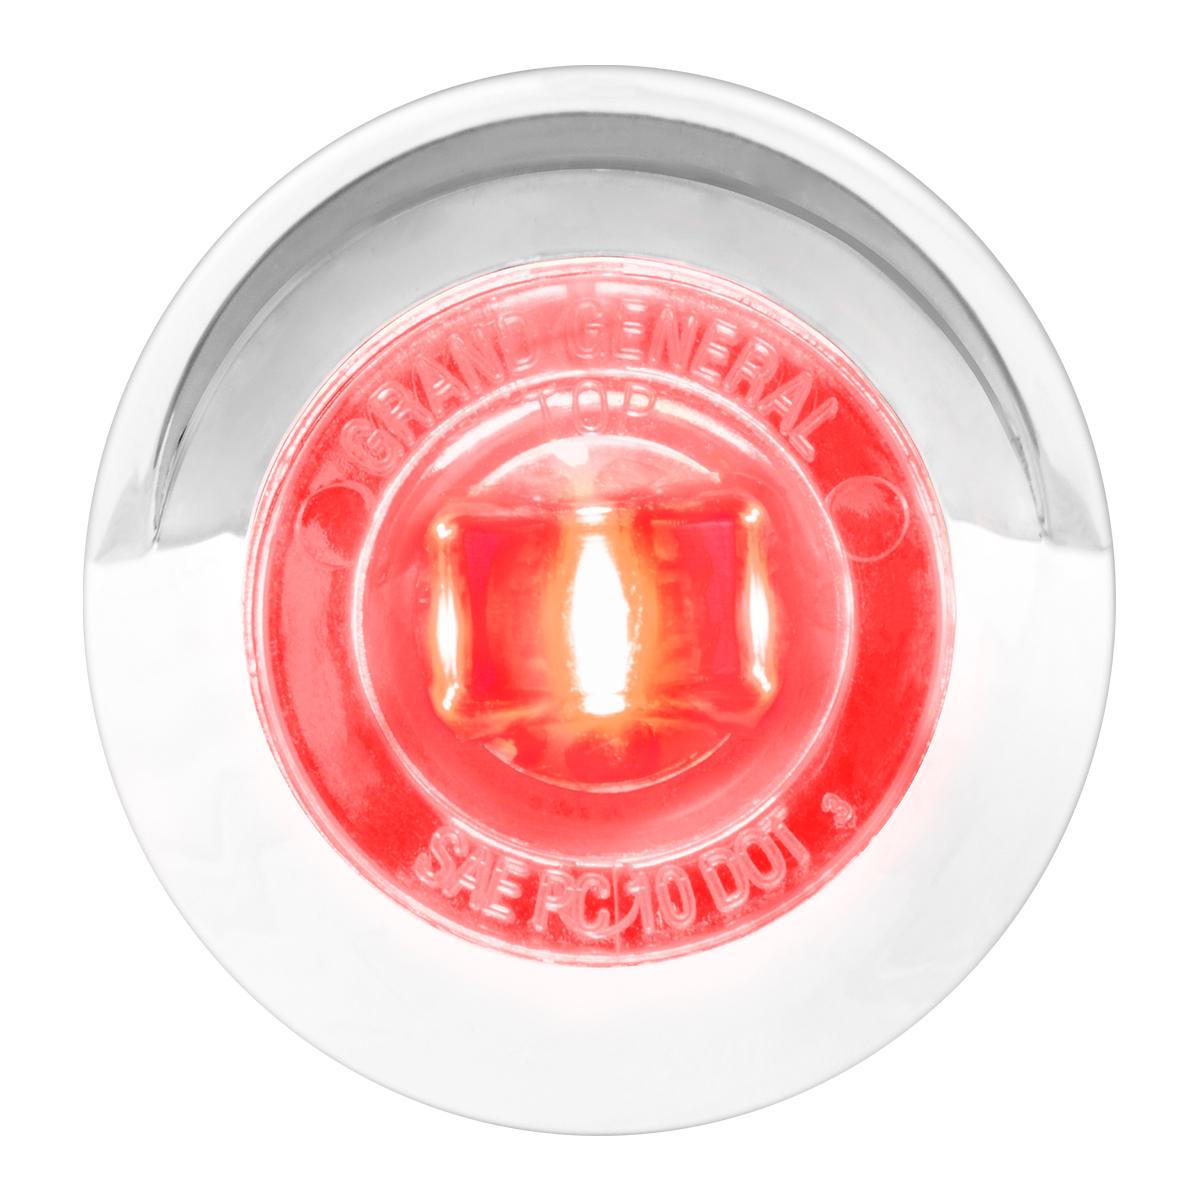 "75233 1-1/4"" Dia. Dual Function LED Light with Chrome Plastic Bezel w/ Visor and Nut"